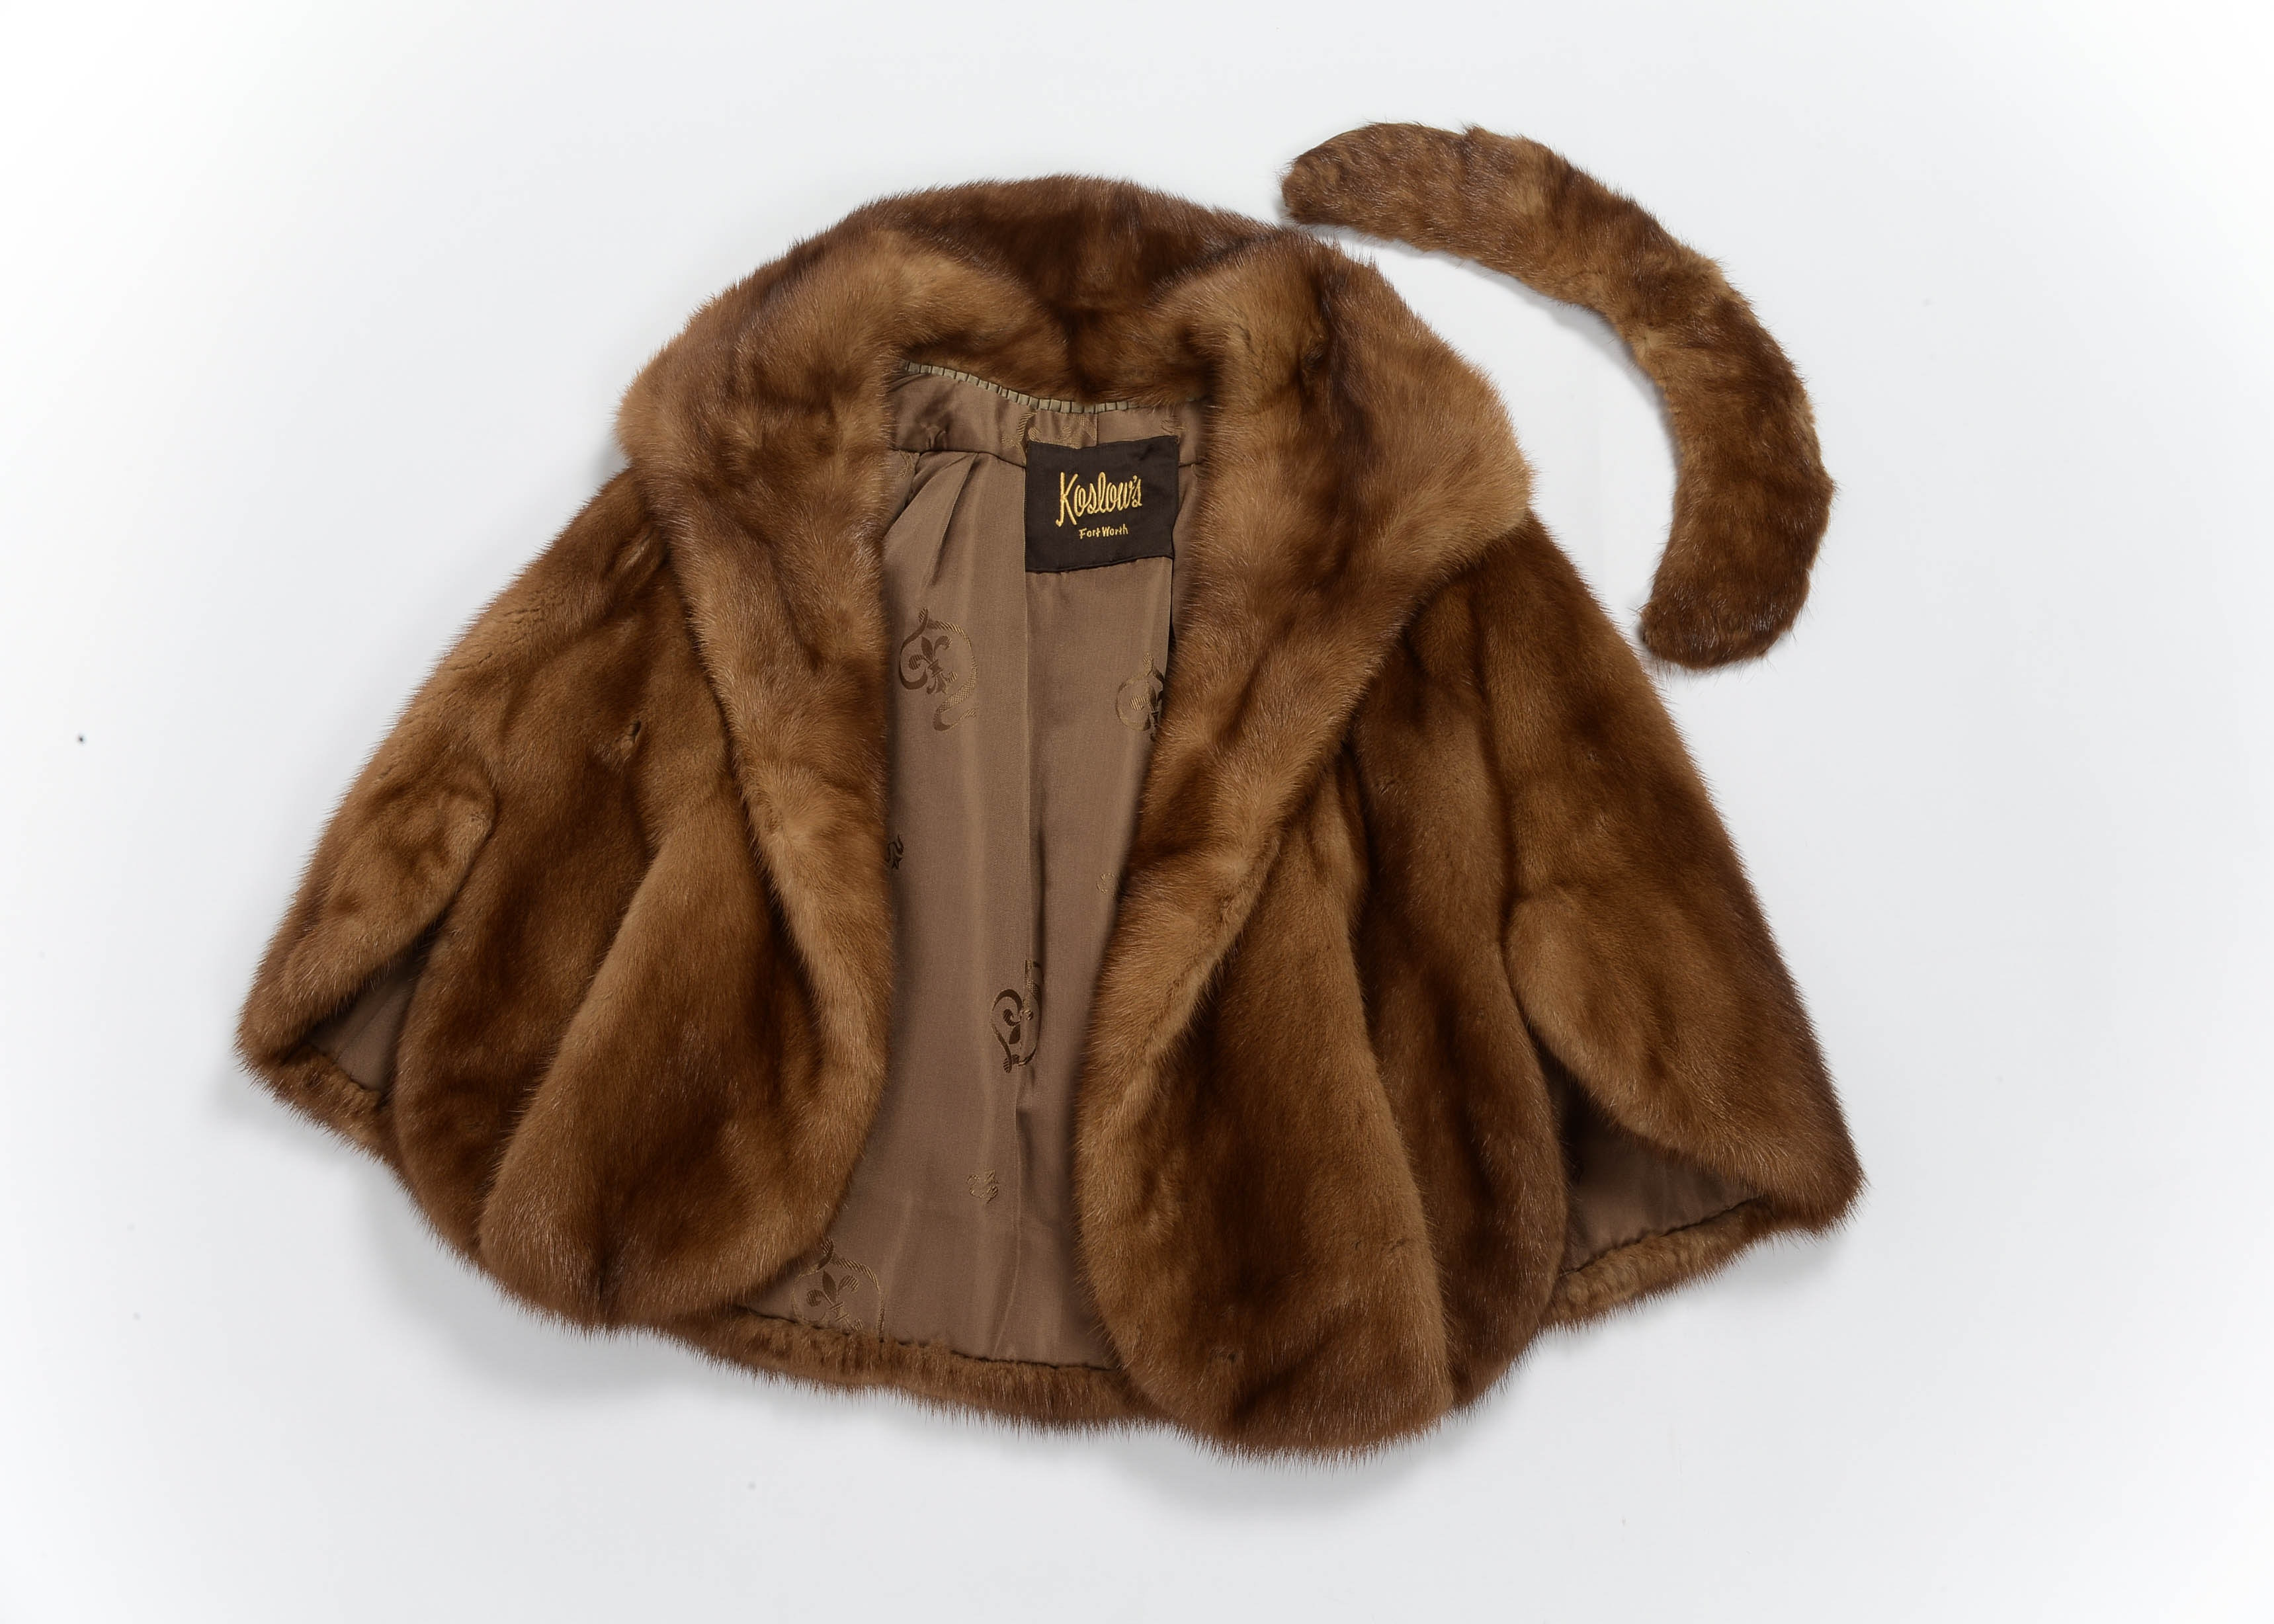 Vintage Fur Coat Auction: Mink Coats, Fox Coats and More in Dallas ...